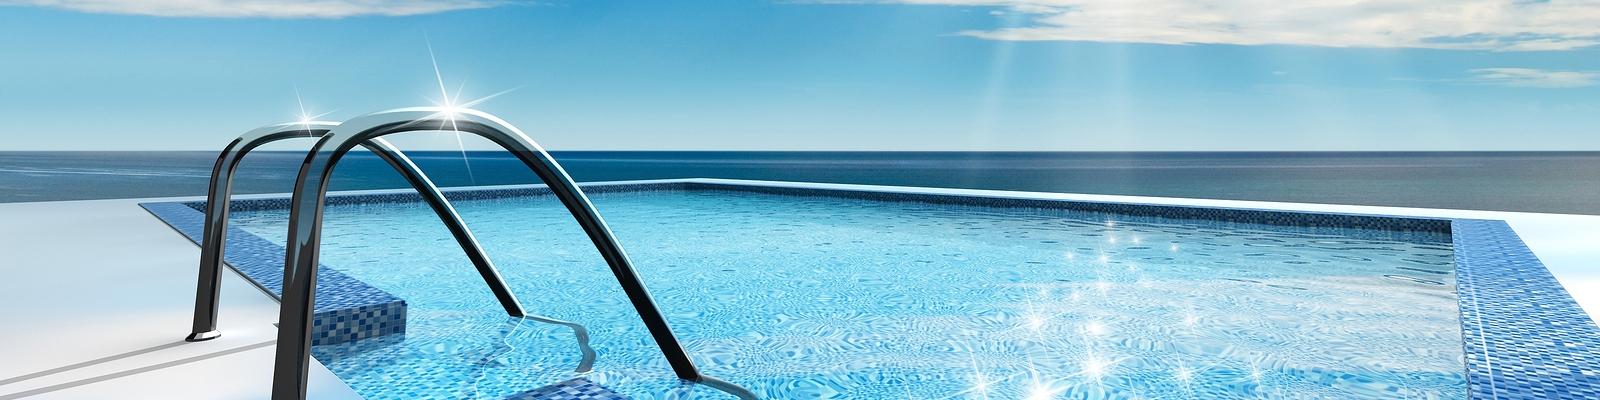 bigstock-Swimming-Pool-2921974-o2udyk3crfnd39uz1eh9fg83tnsfcthdw4keusiun4